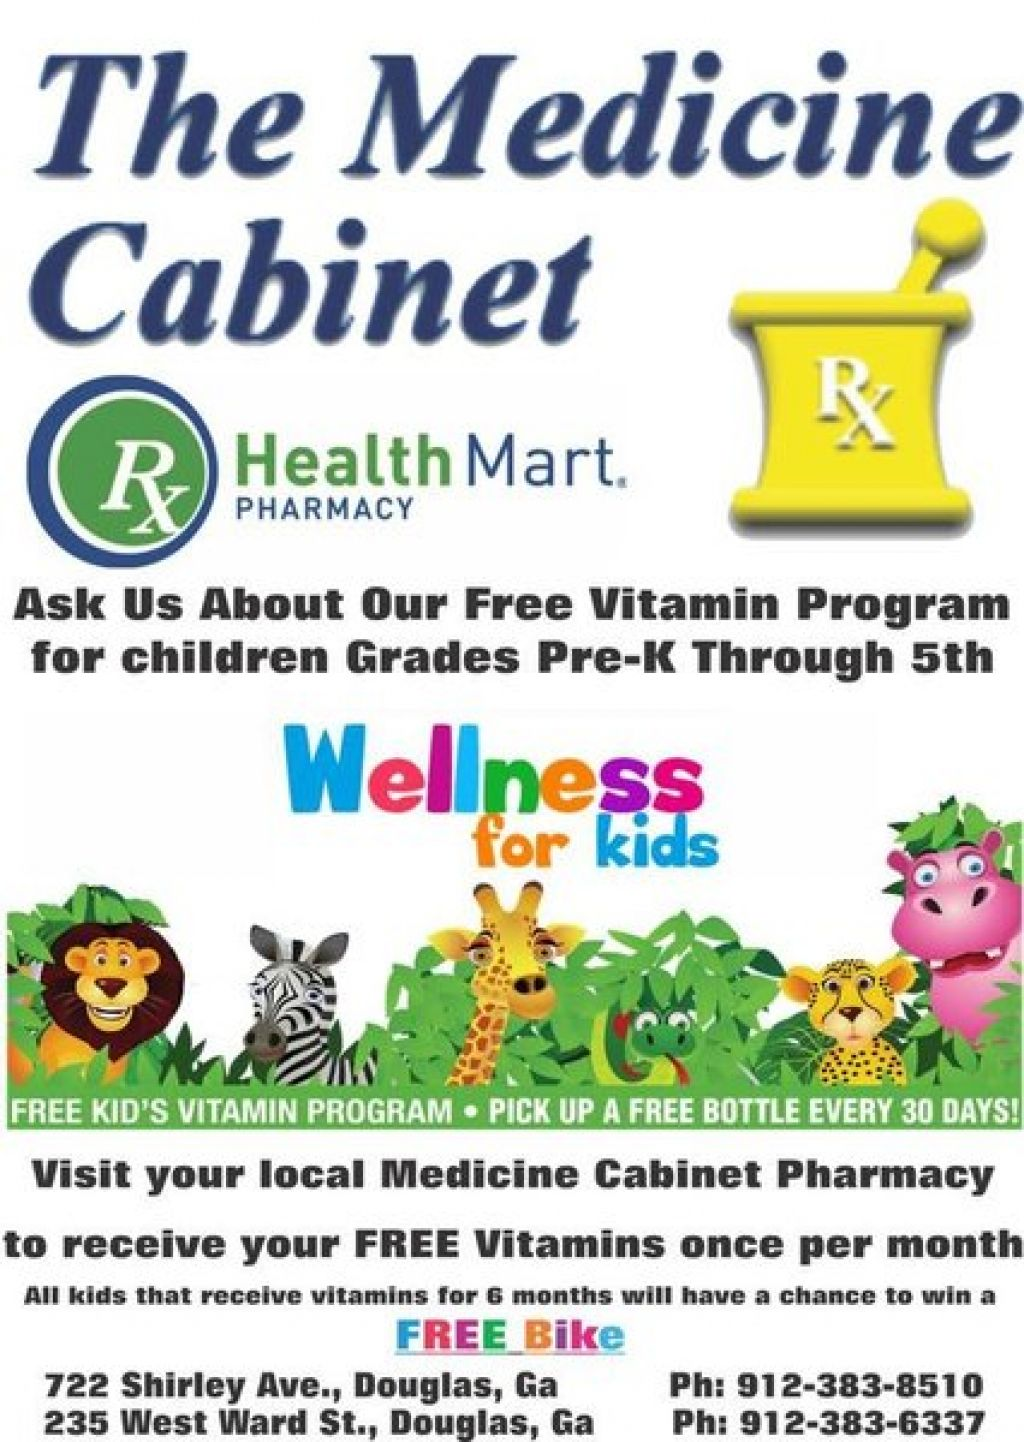 Medicine Cabinet offers free kid's vitamin program